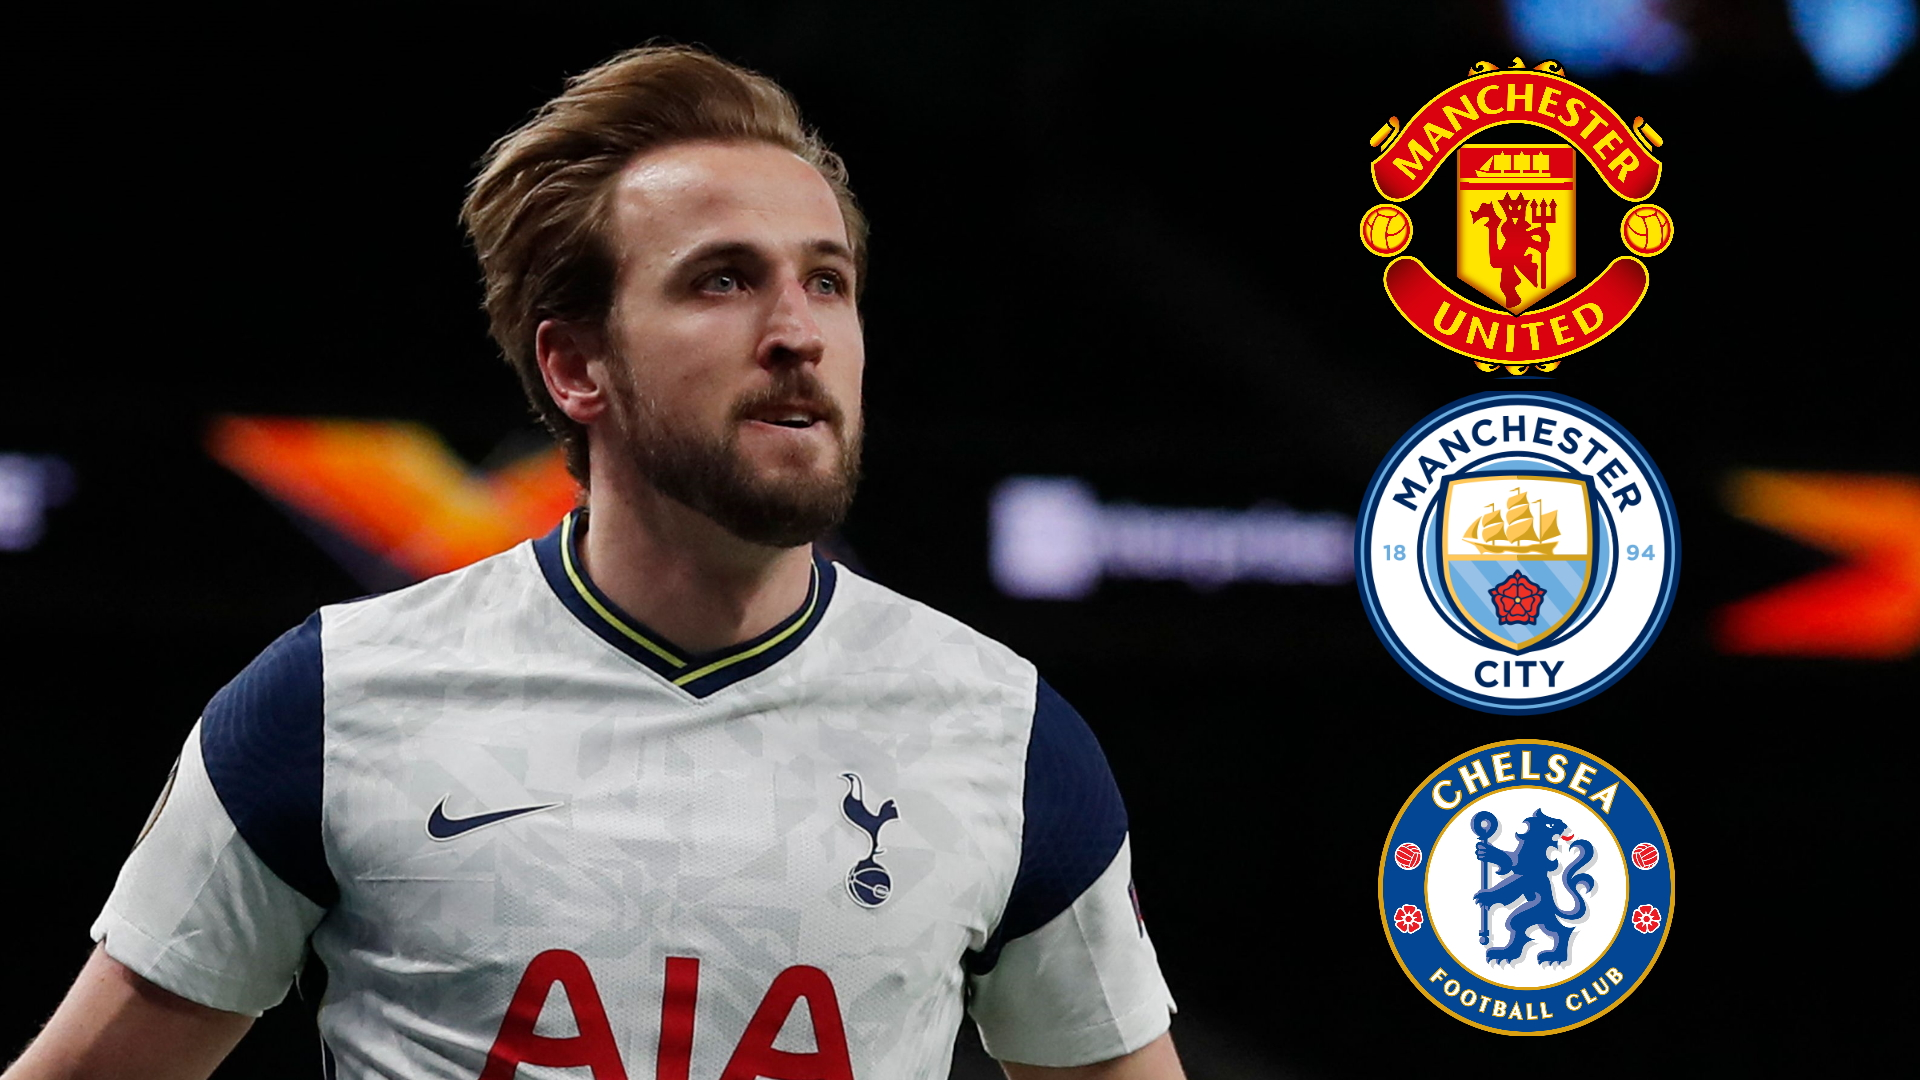 Kane Tells Tottenham He Wants To Leave This Summer Amid Man Utd Man City Chelsea Links Goal Com